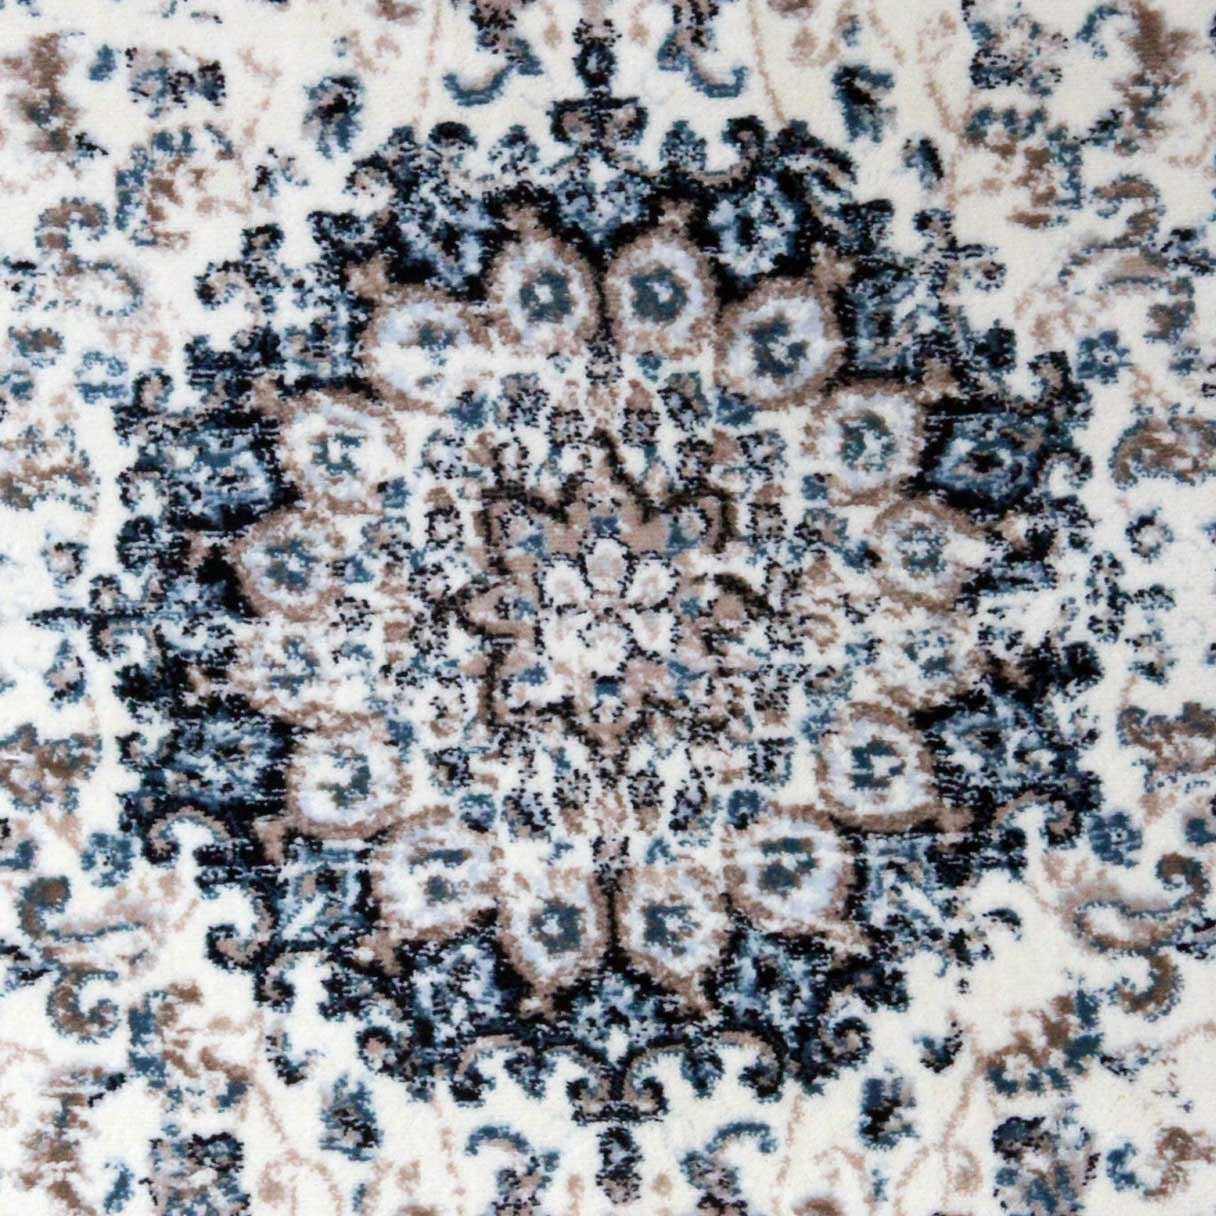 Area-di-Pavimento-Soggiorno-Tappeti-Navy-Avorio-Vintage-Oriental-Floral-Medallion-Rugs miniatura 12